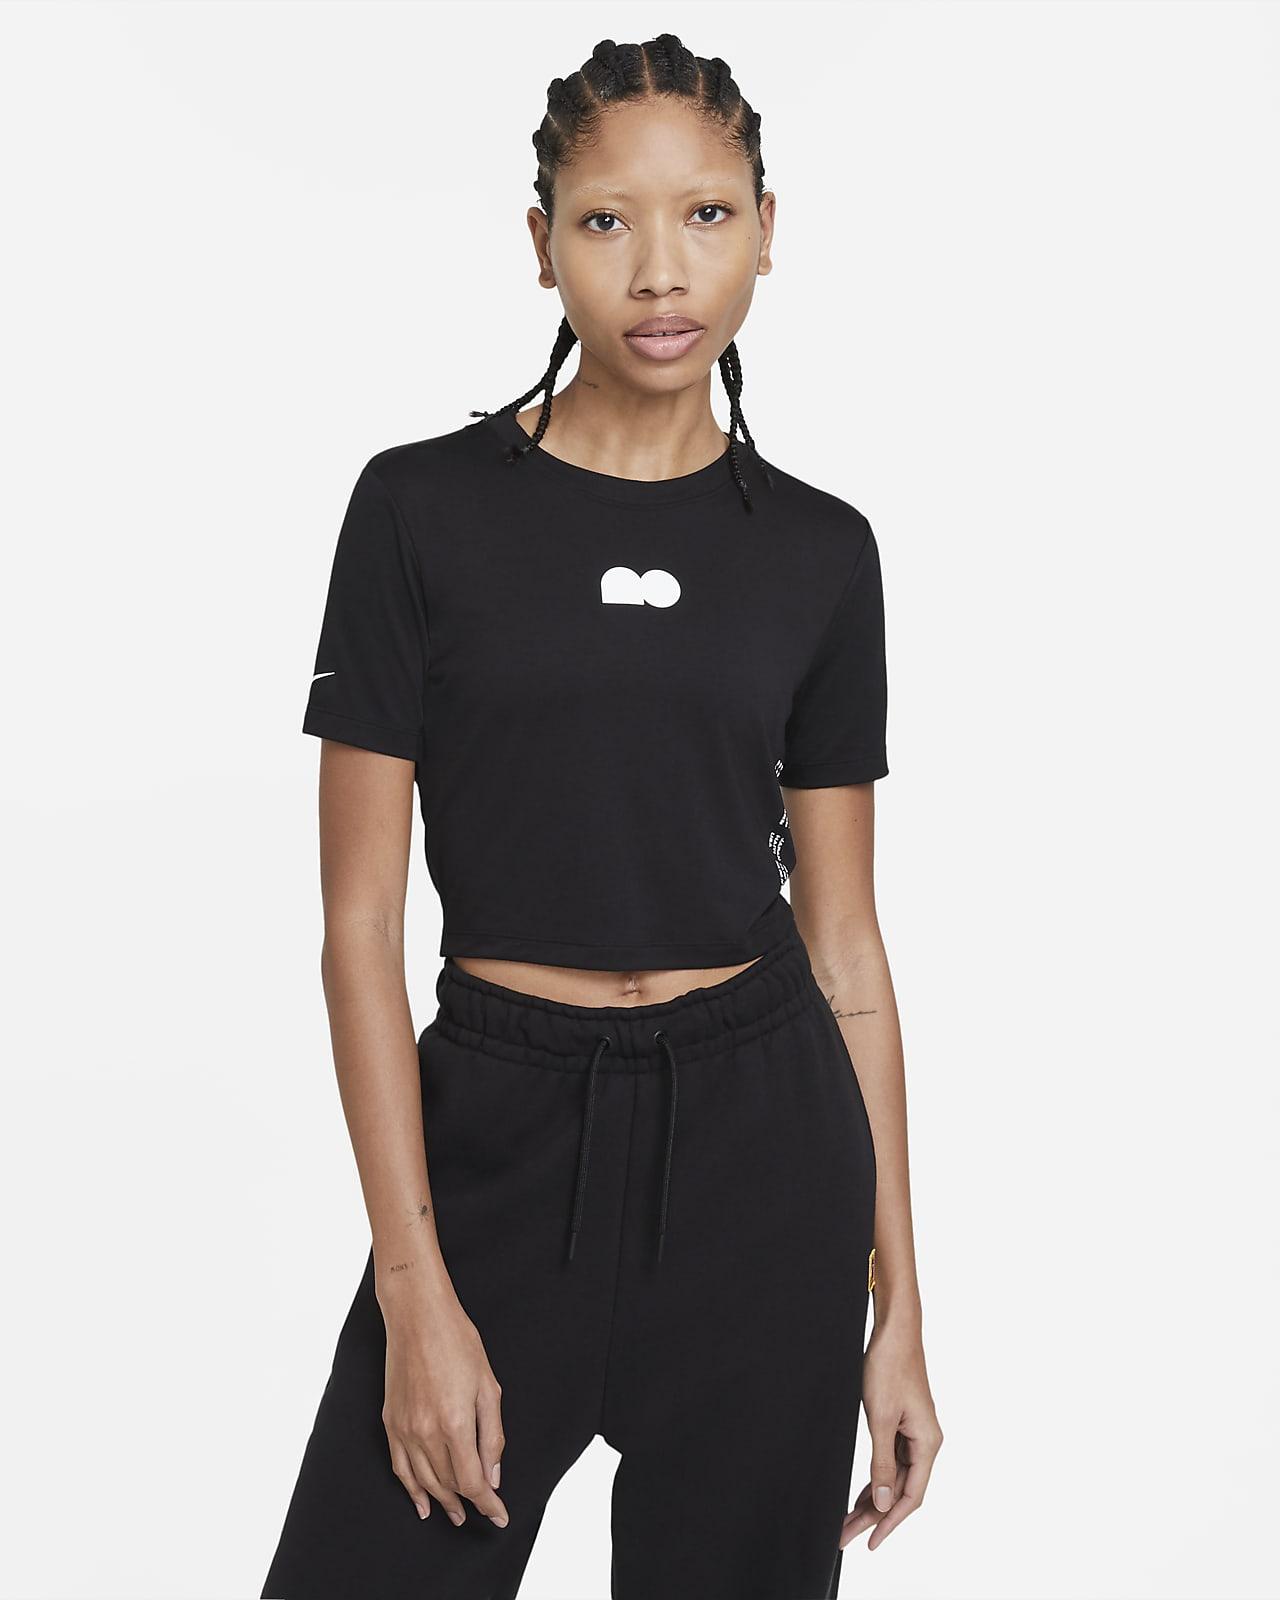 Naomi Osaka Cropped Tennis T-Shirt